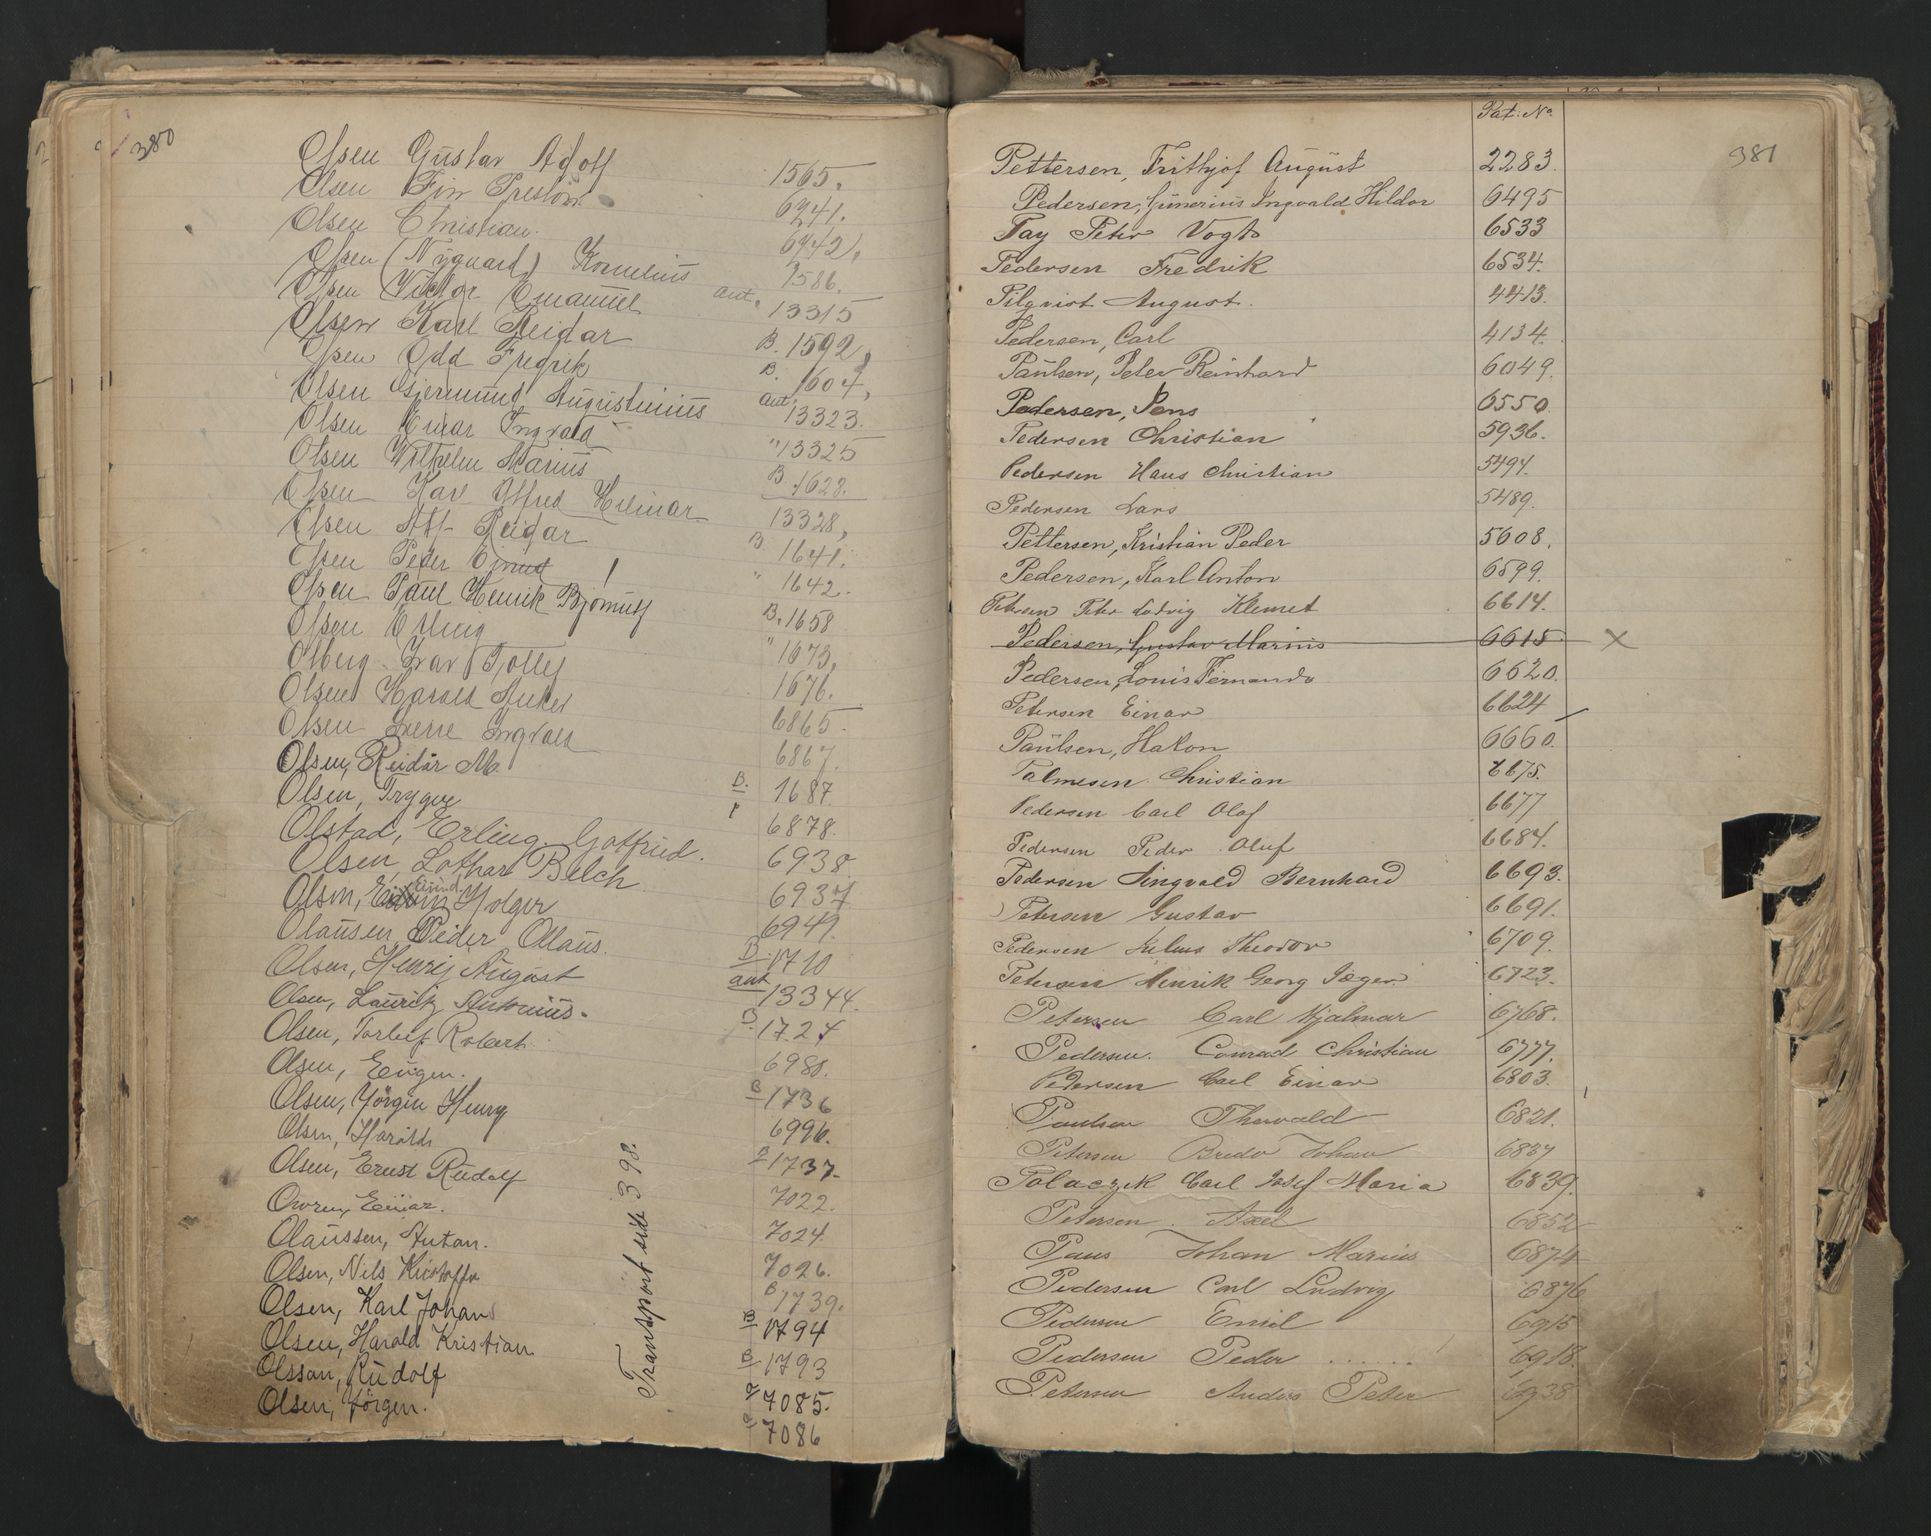 SAO, Oslo sjømannskontor, F/Fa/L0002: Register for Kristiania krets, 1866-1930, s. 380-381